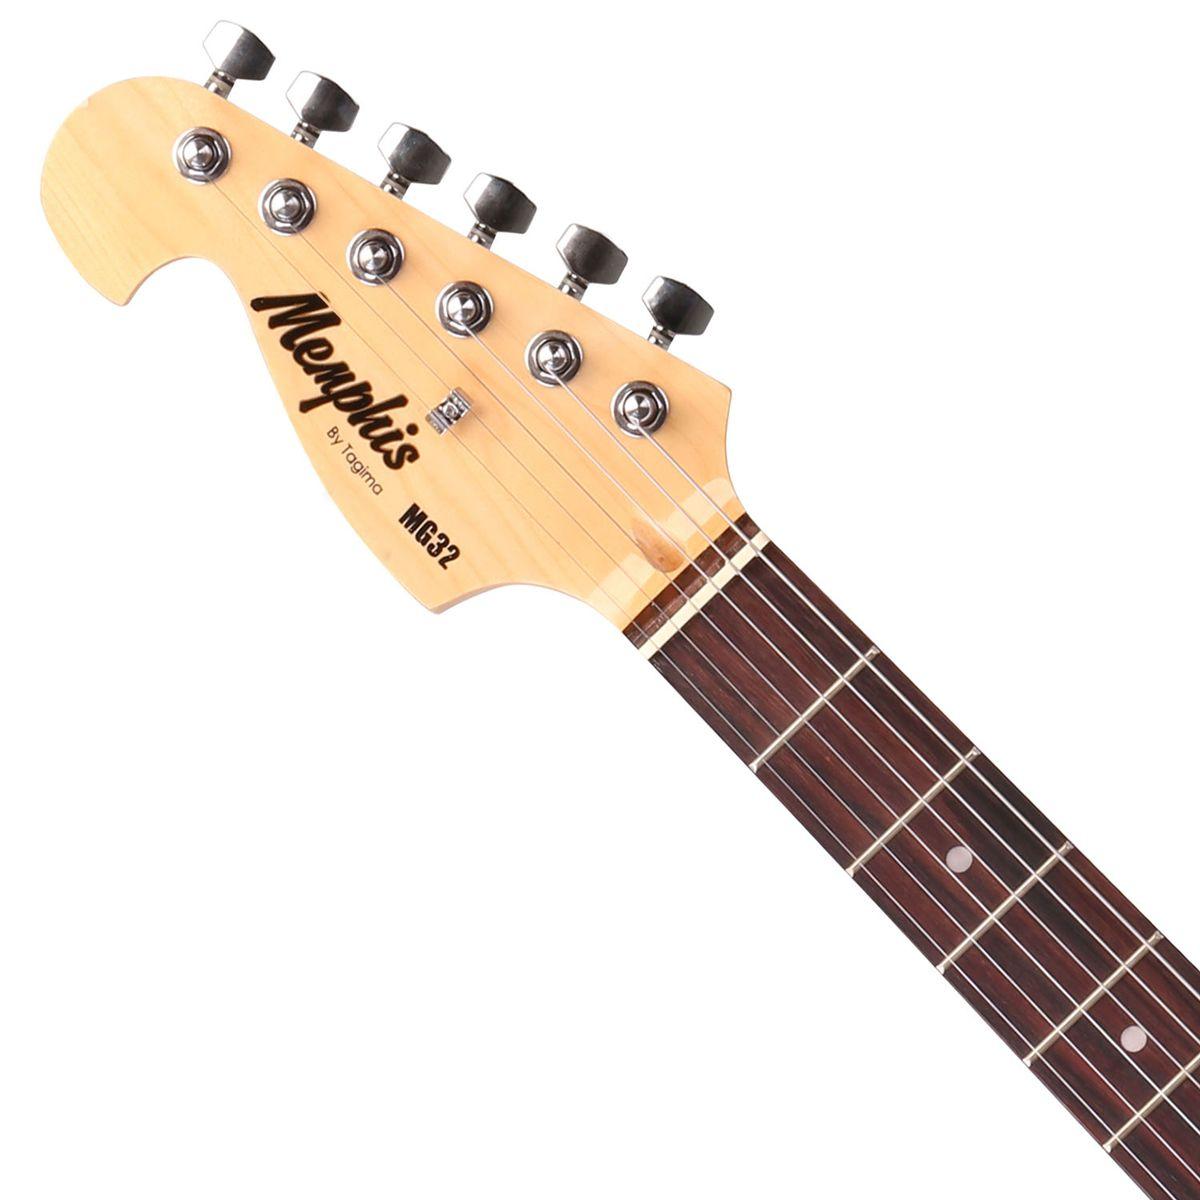 Guitarra Tagima Memphis Mg 32 Sb Lh Canhoto